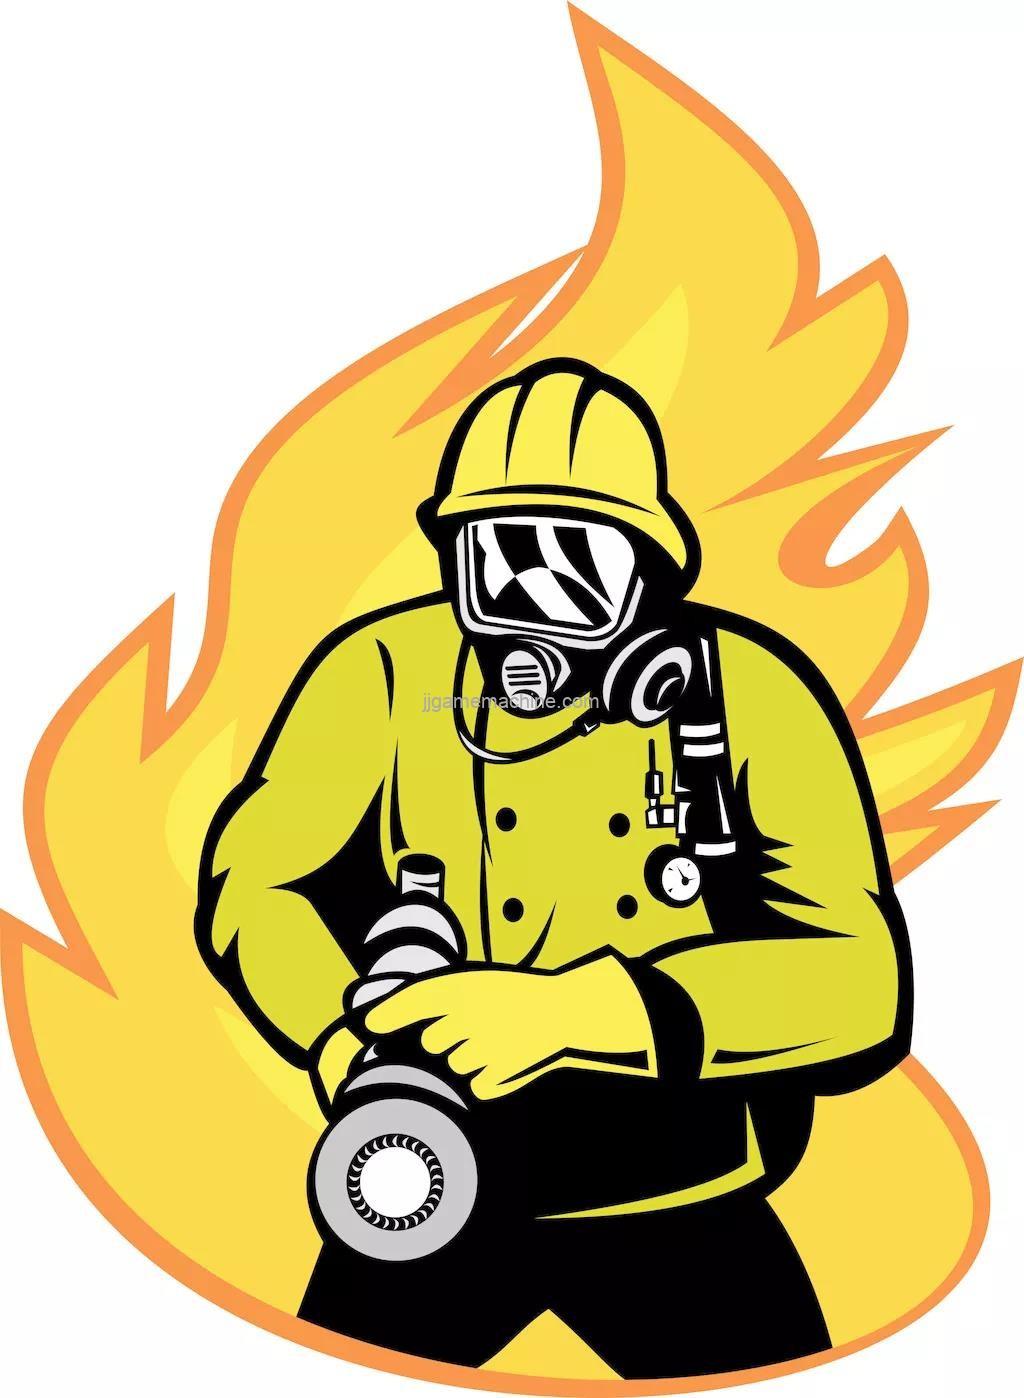 Firefighting common sense necessary for indoor children's park sales staff